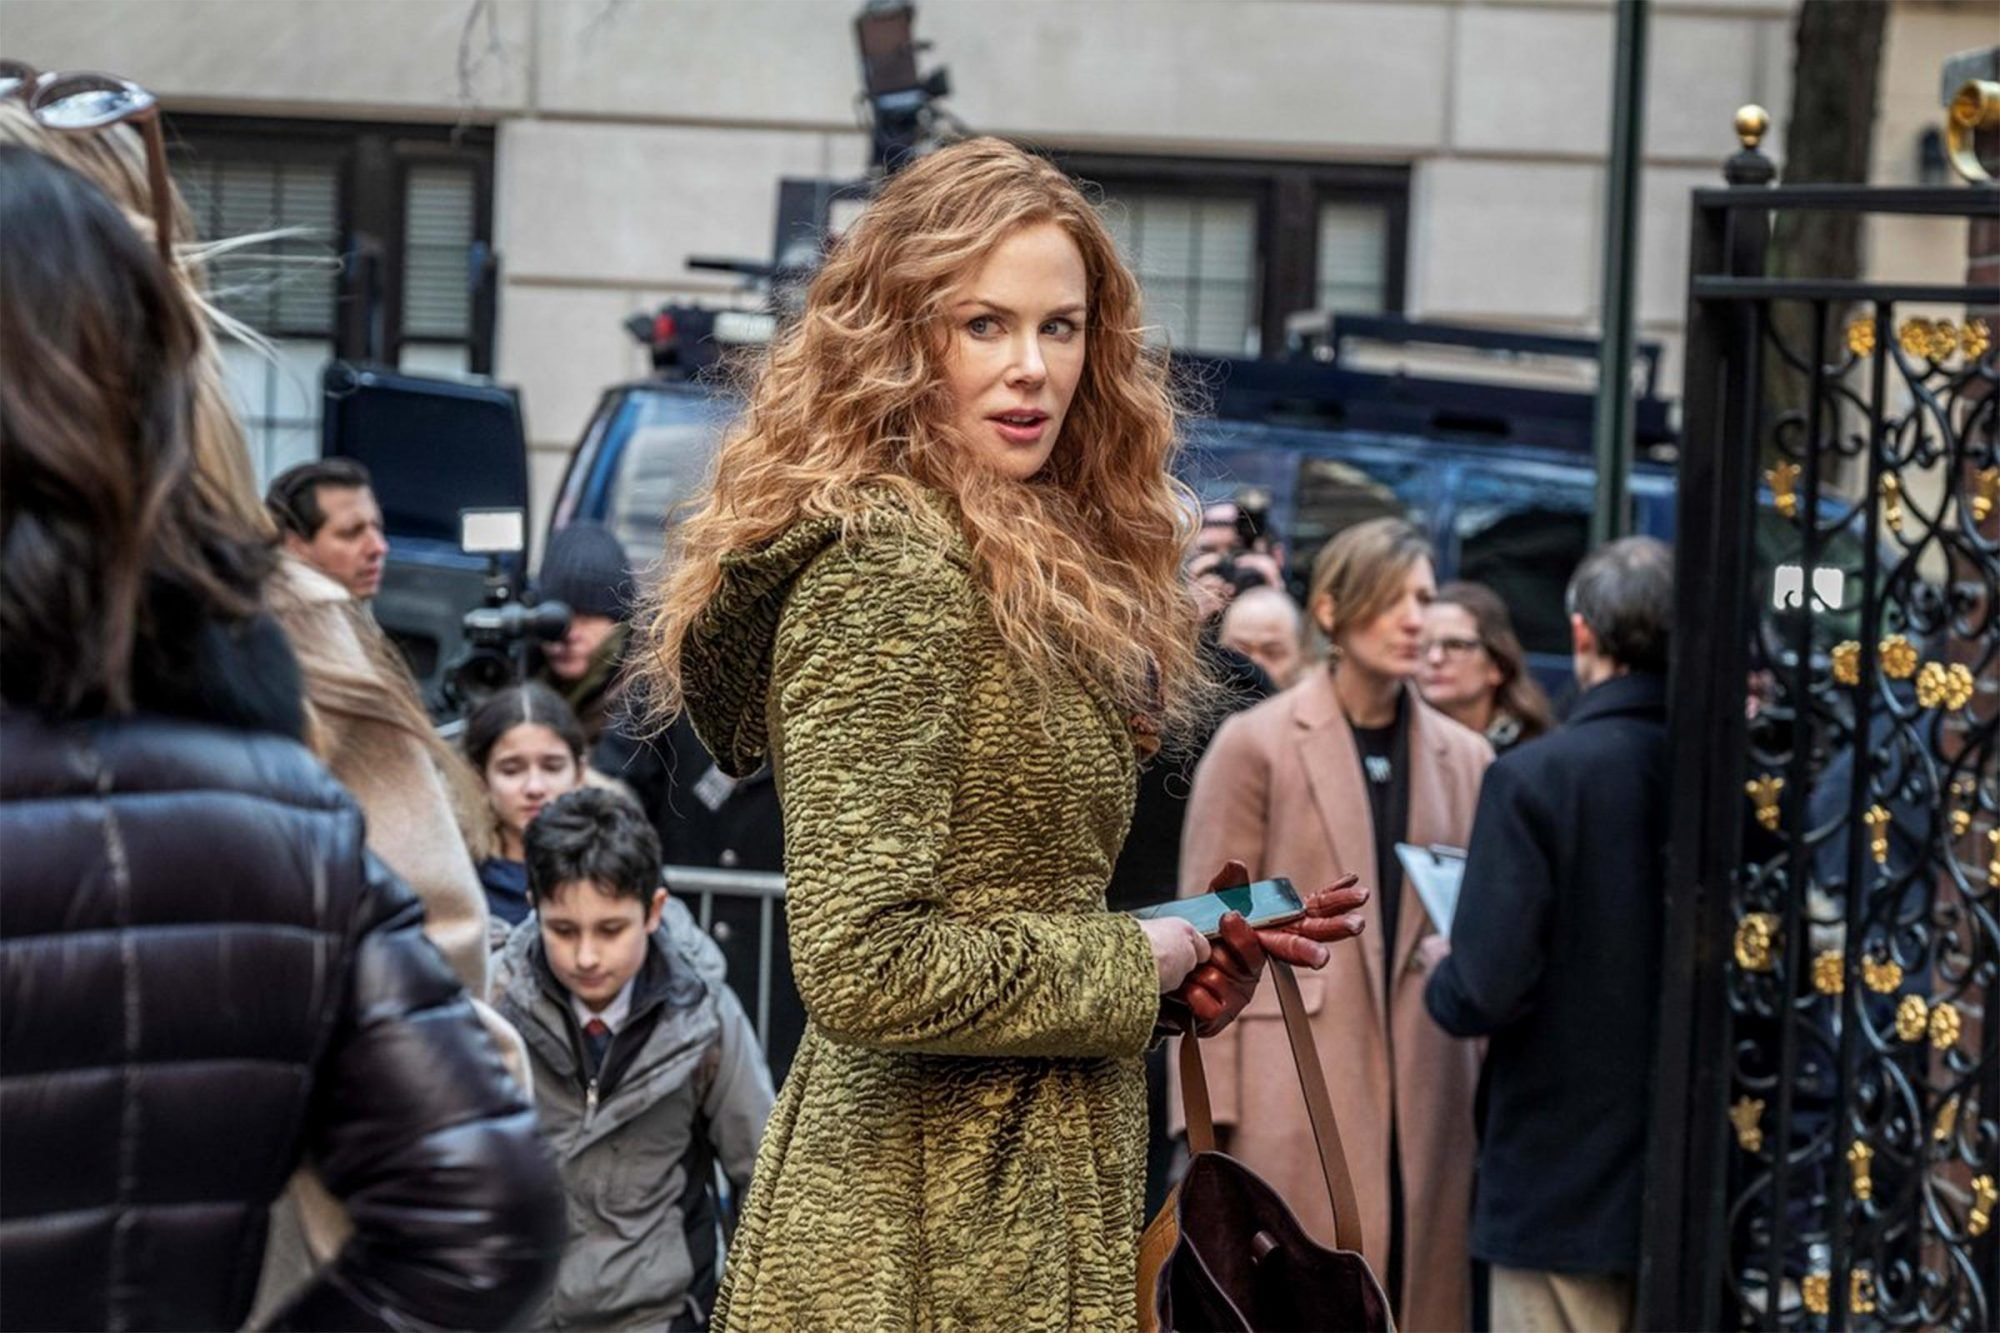 Nicole Kidman Sets The Stage For Twisty David E Kelley Series In The Undoing Photos In 2020 Nicole Kidman Nicole Teresa Palmer